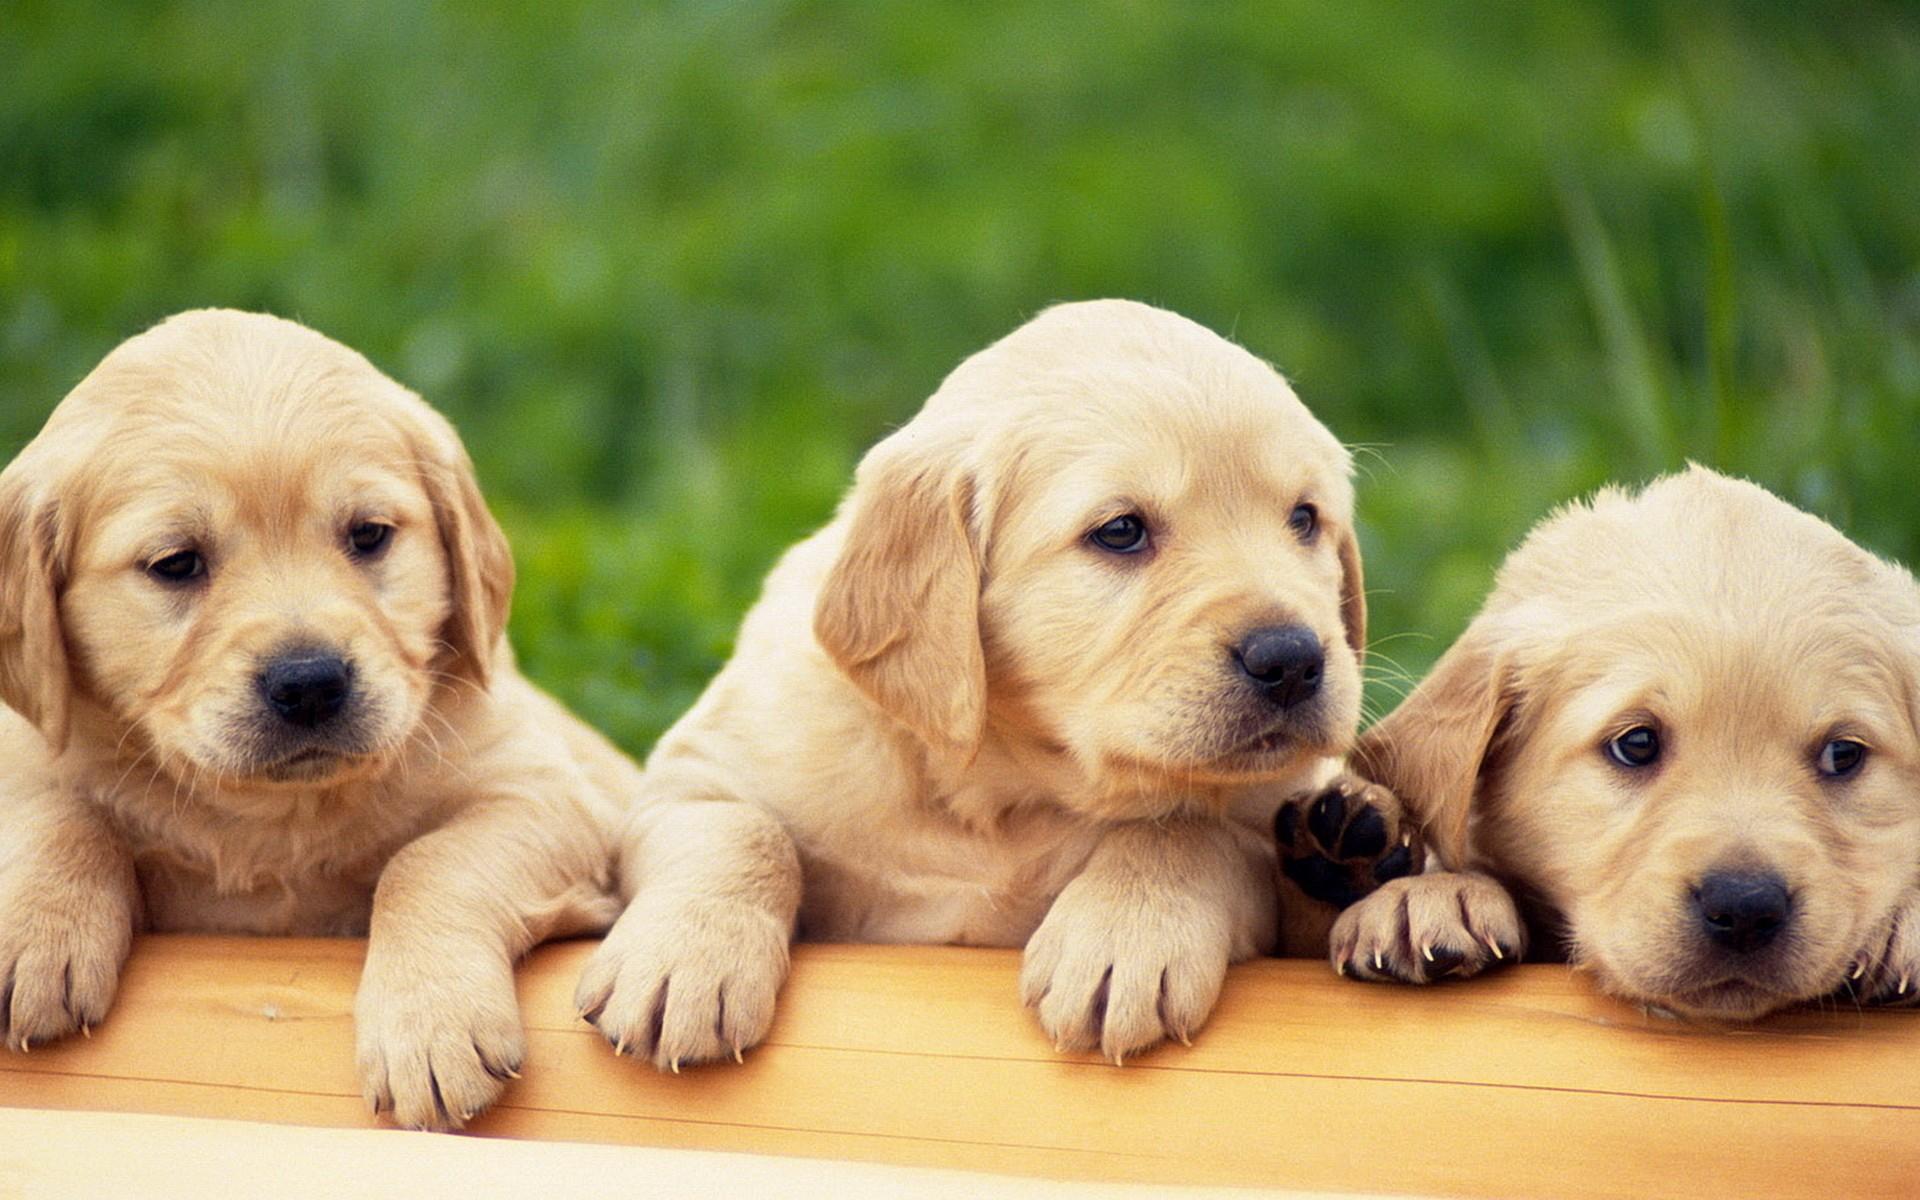 Yellow Labrador Puppies Wallpapers Desktop Backgrounds 1920x1200 Id 1920x1200